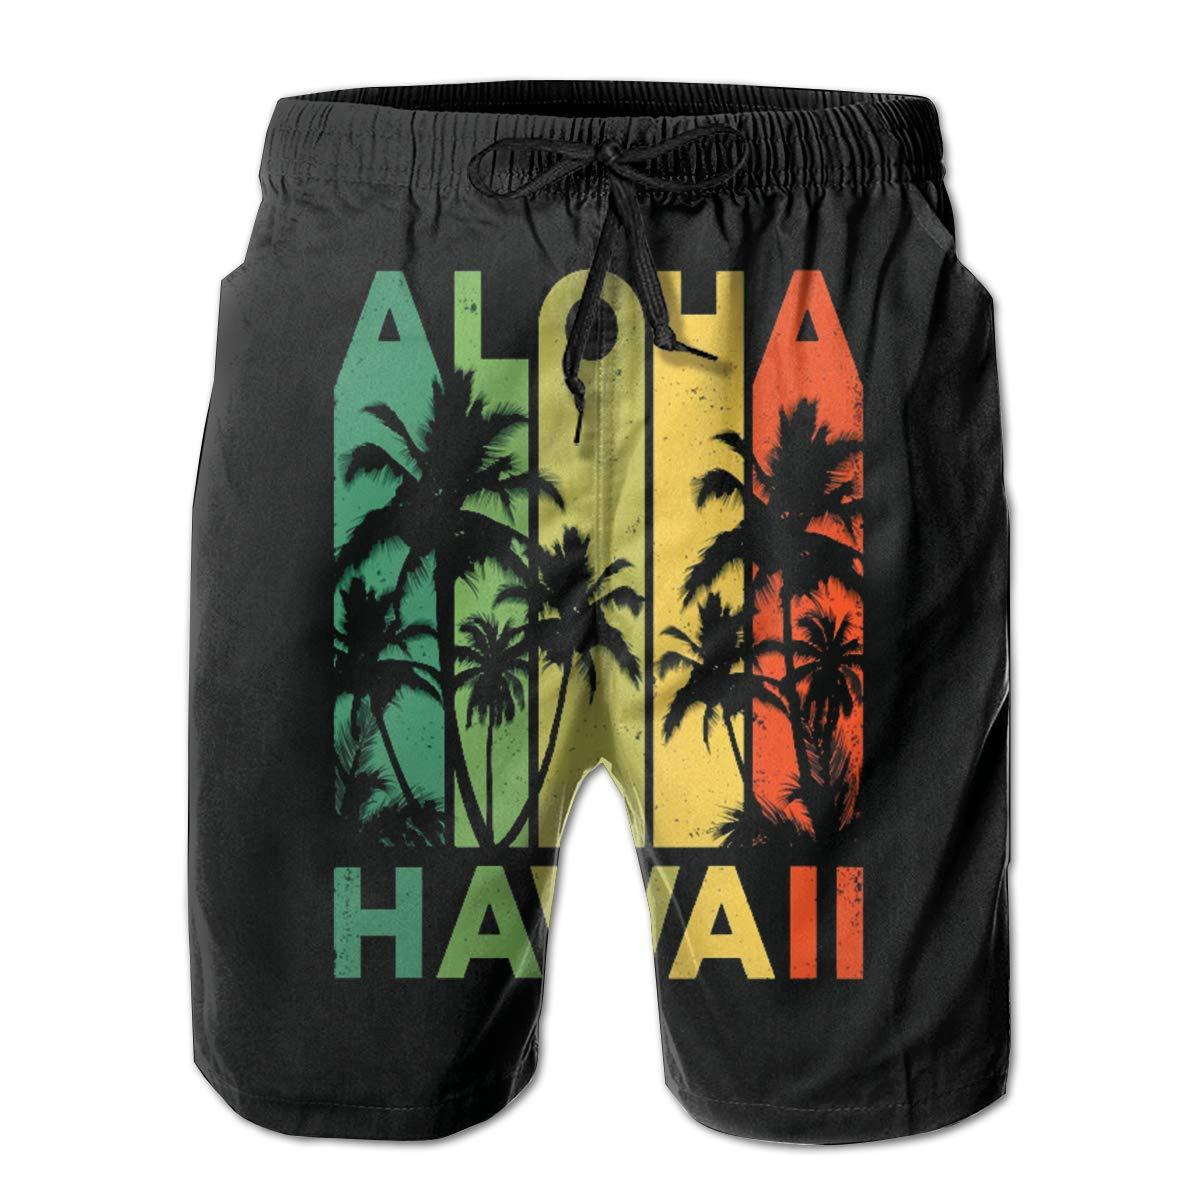 Fashion Mens Vintage Hawaiian Islands Beach Shorts Board Shorts Casual Shorts Swim Trunks